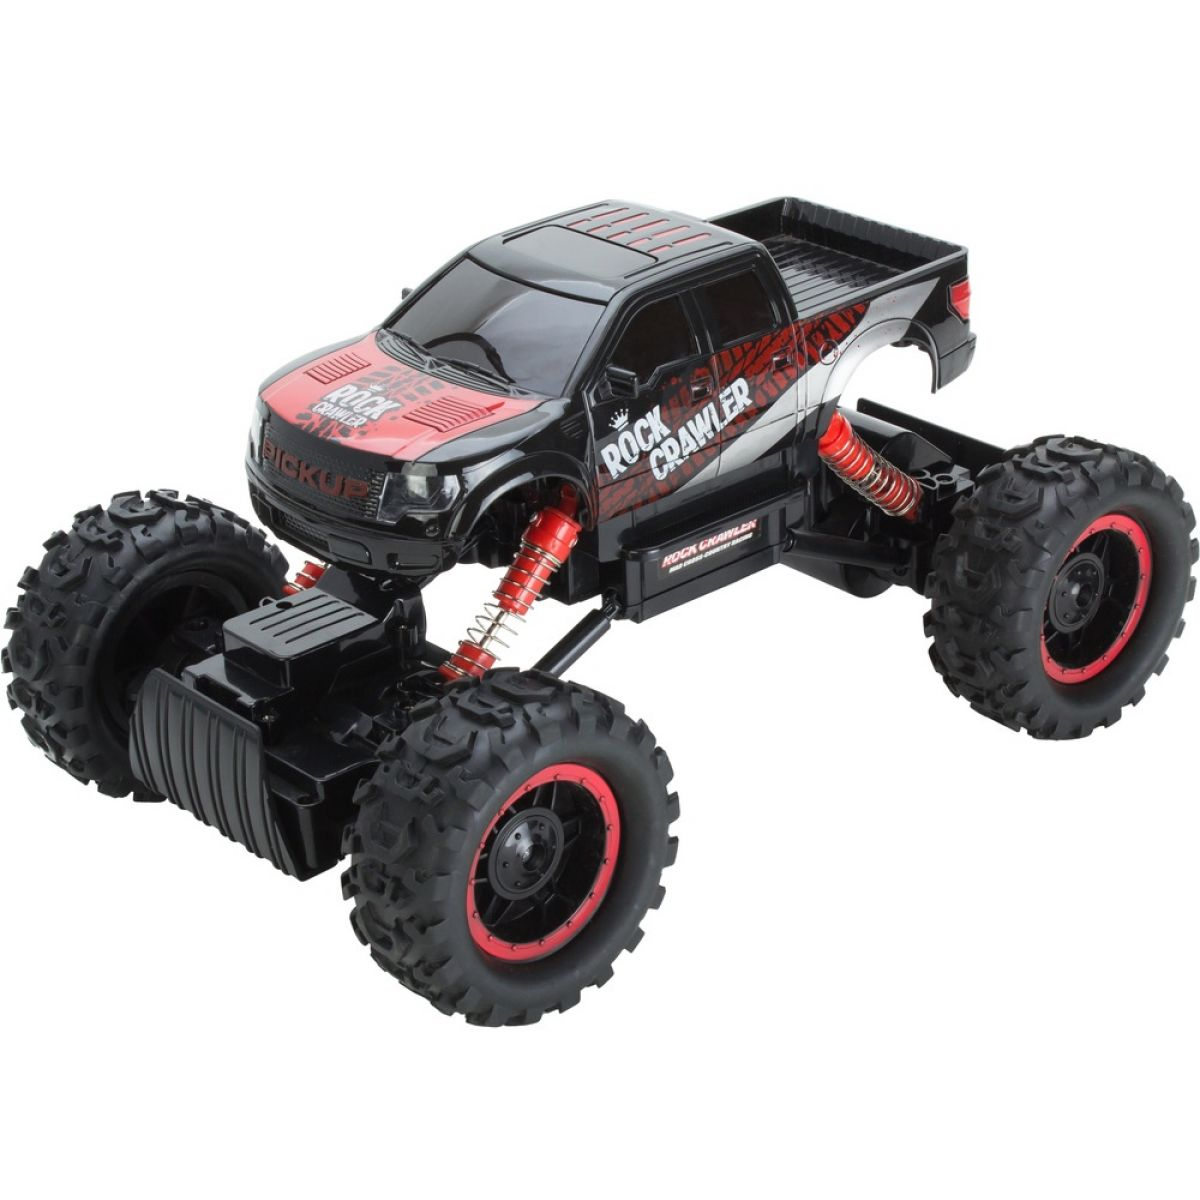 Buddy Toys RC Auto Rock Climber 1:14